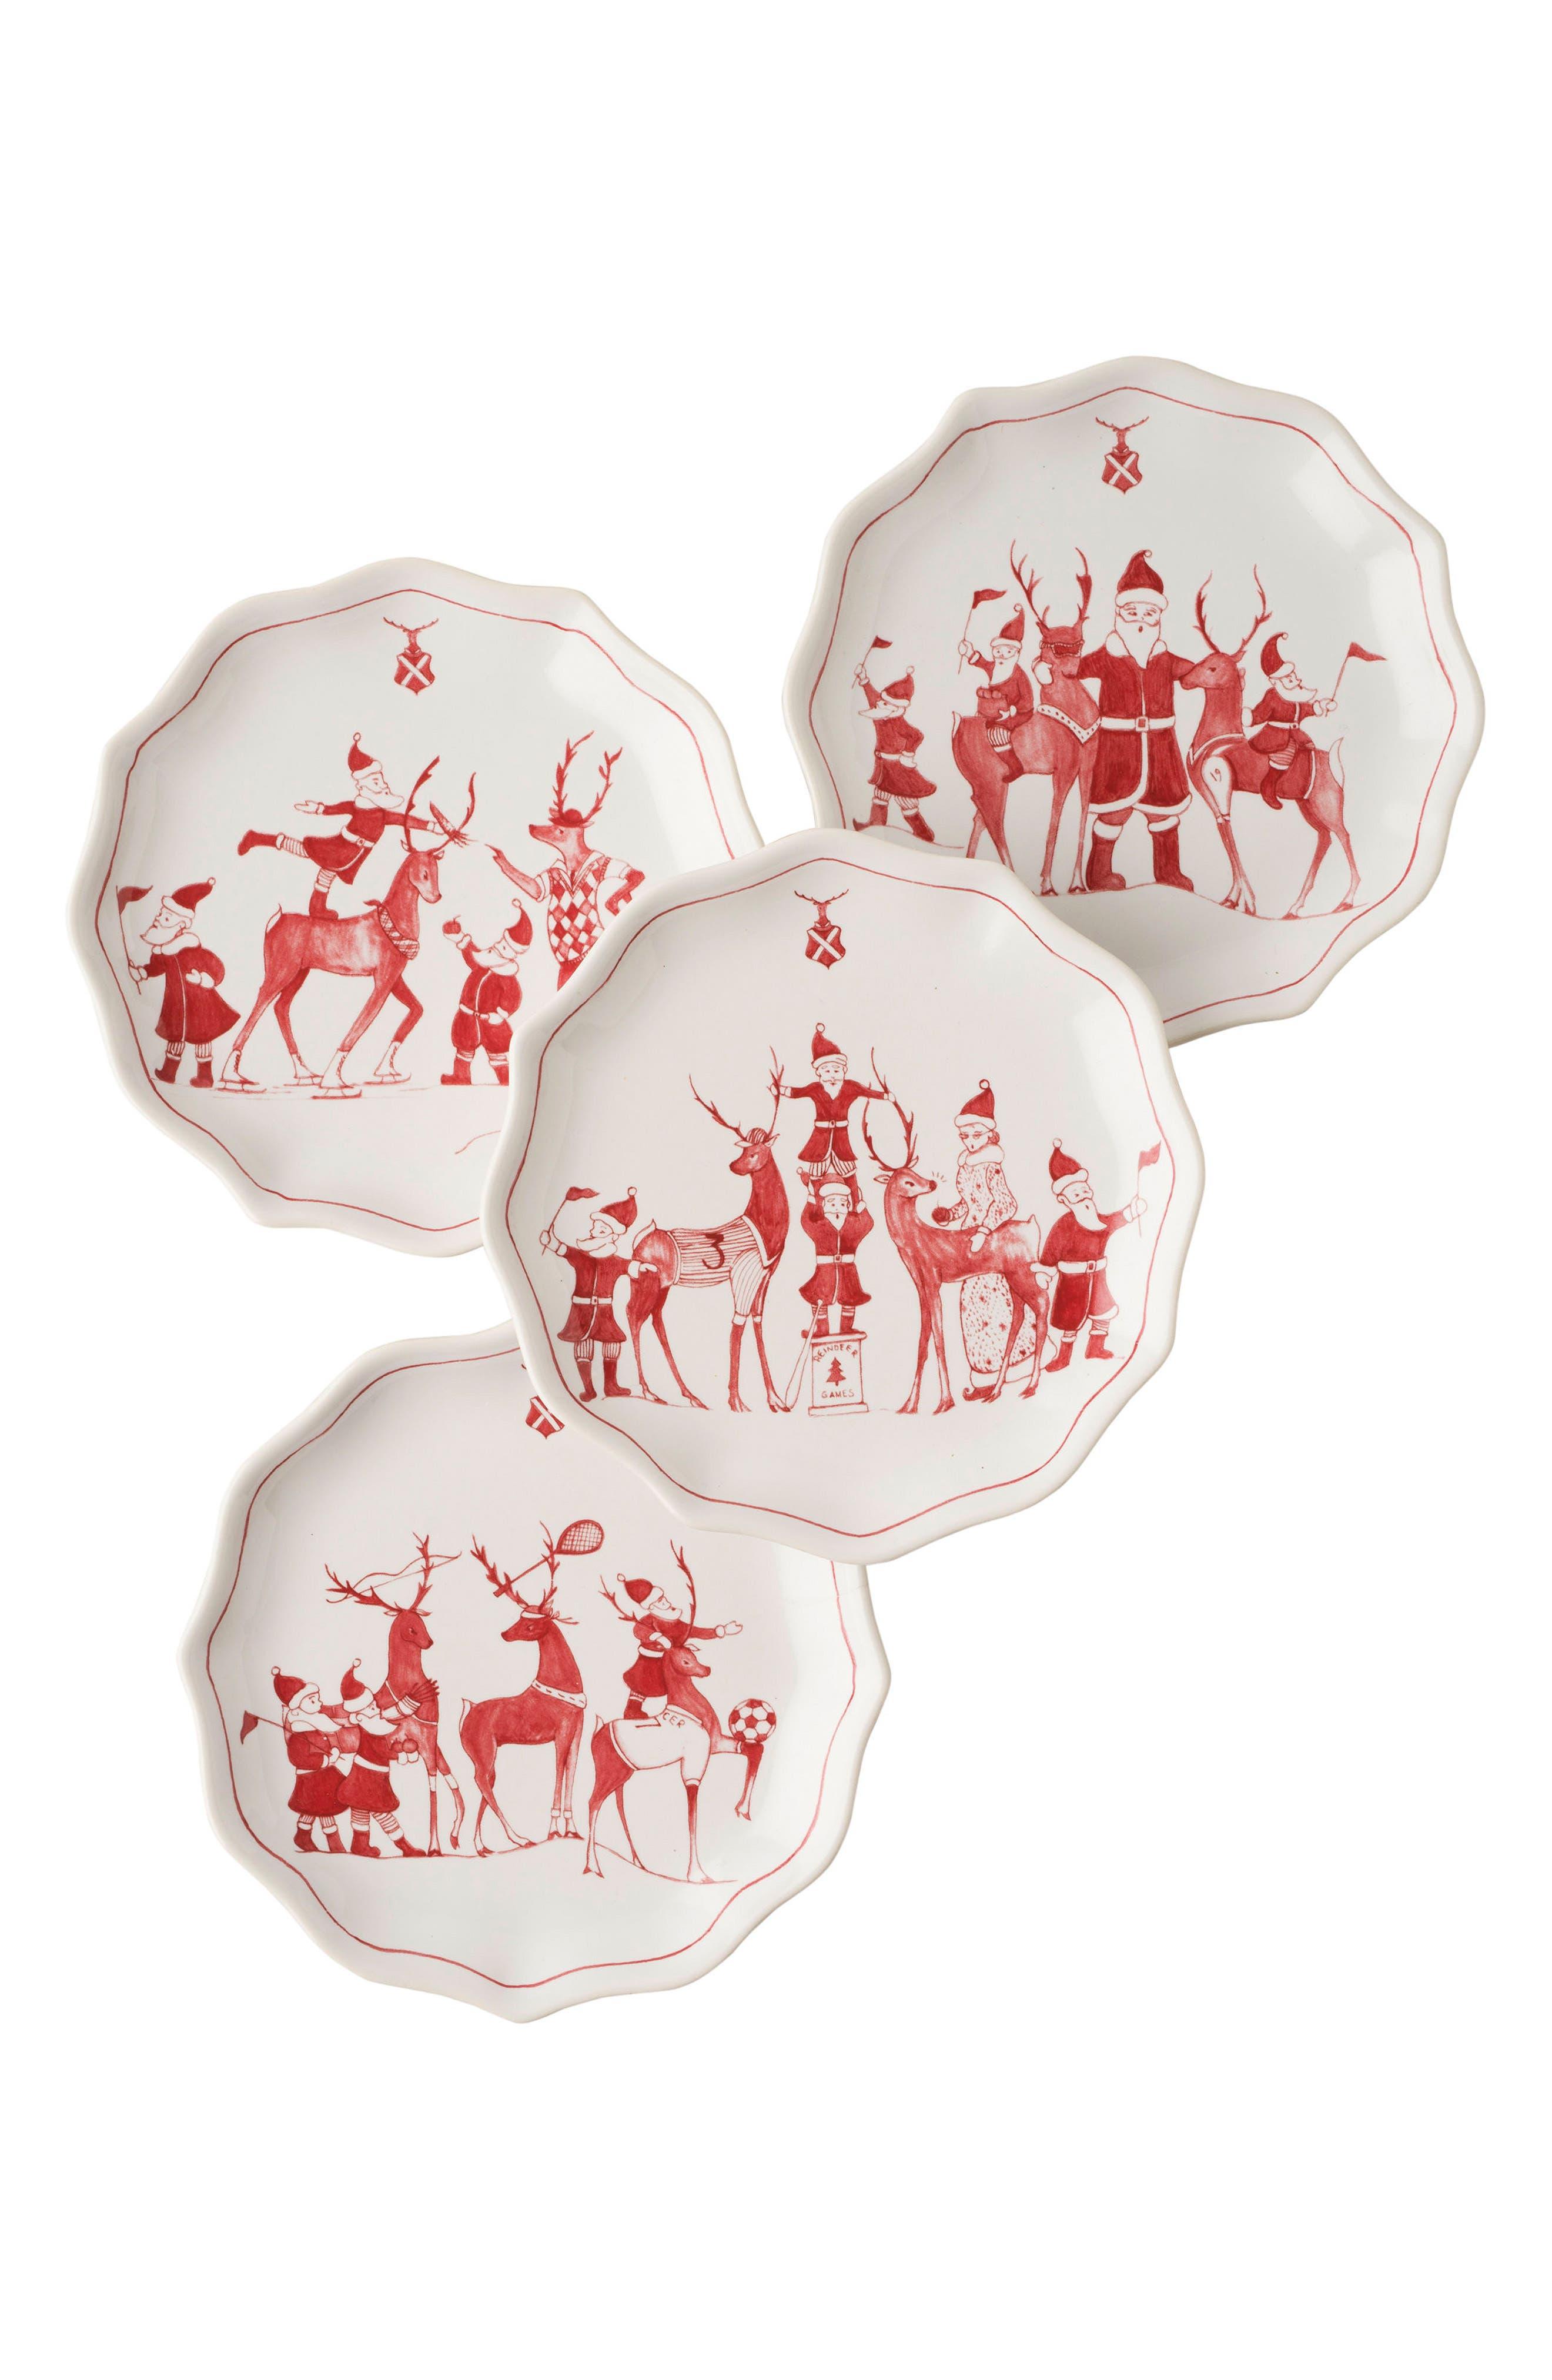 Reindeer Games Set of 4 Ceramic Tidbit Plates,                         Main,                         color, RUBY